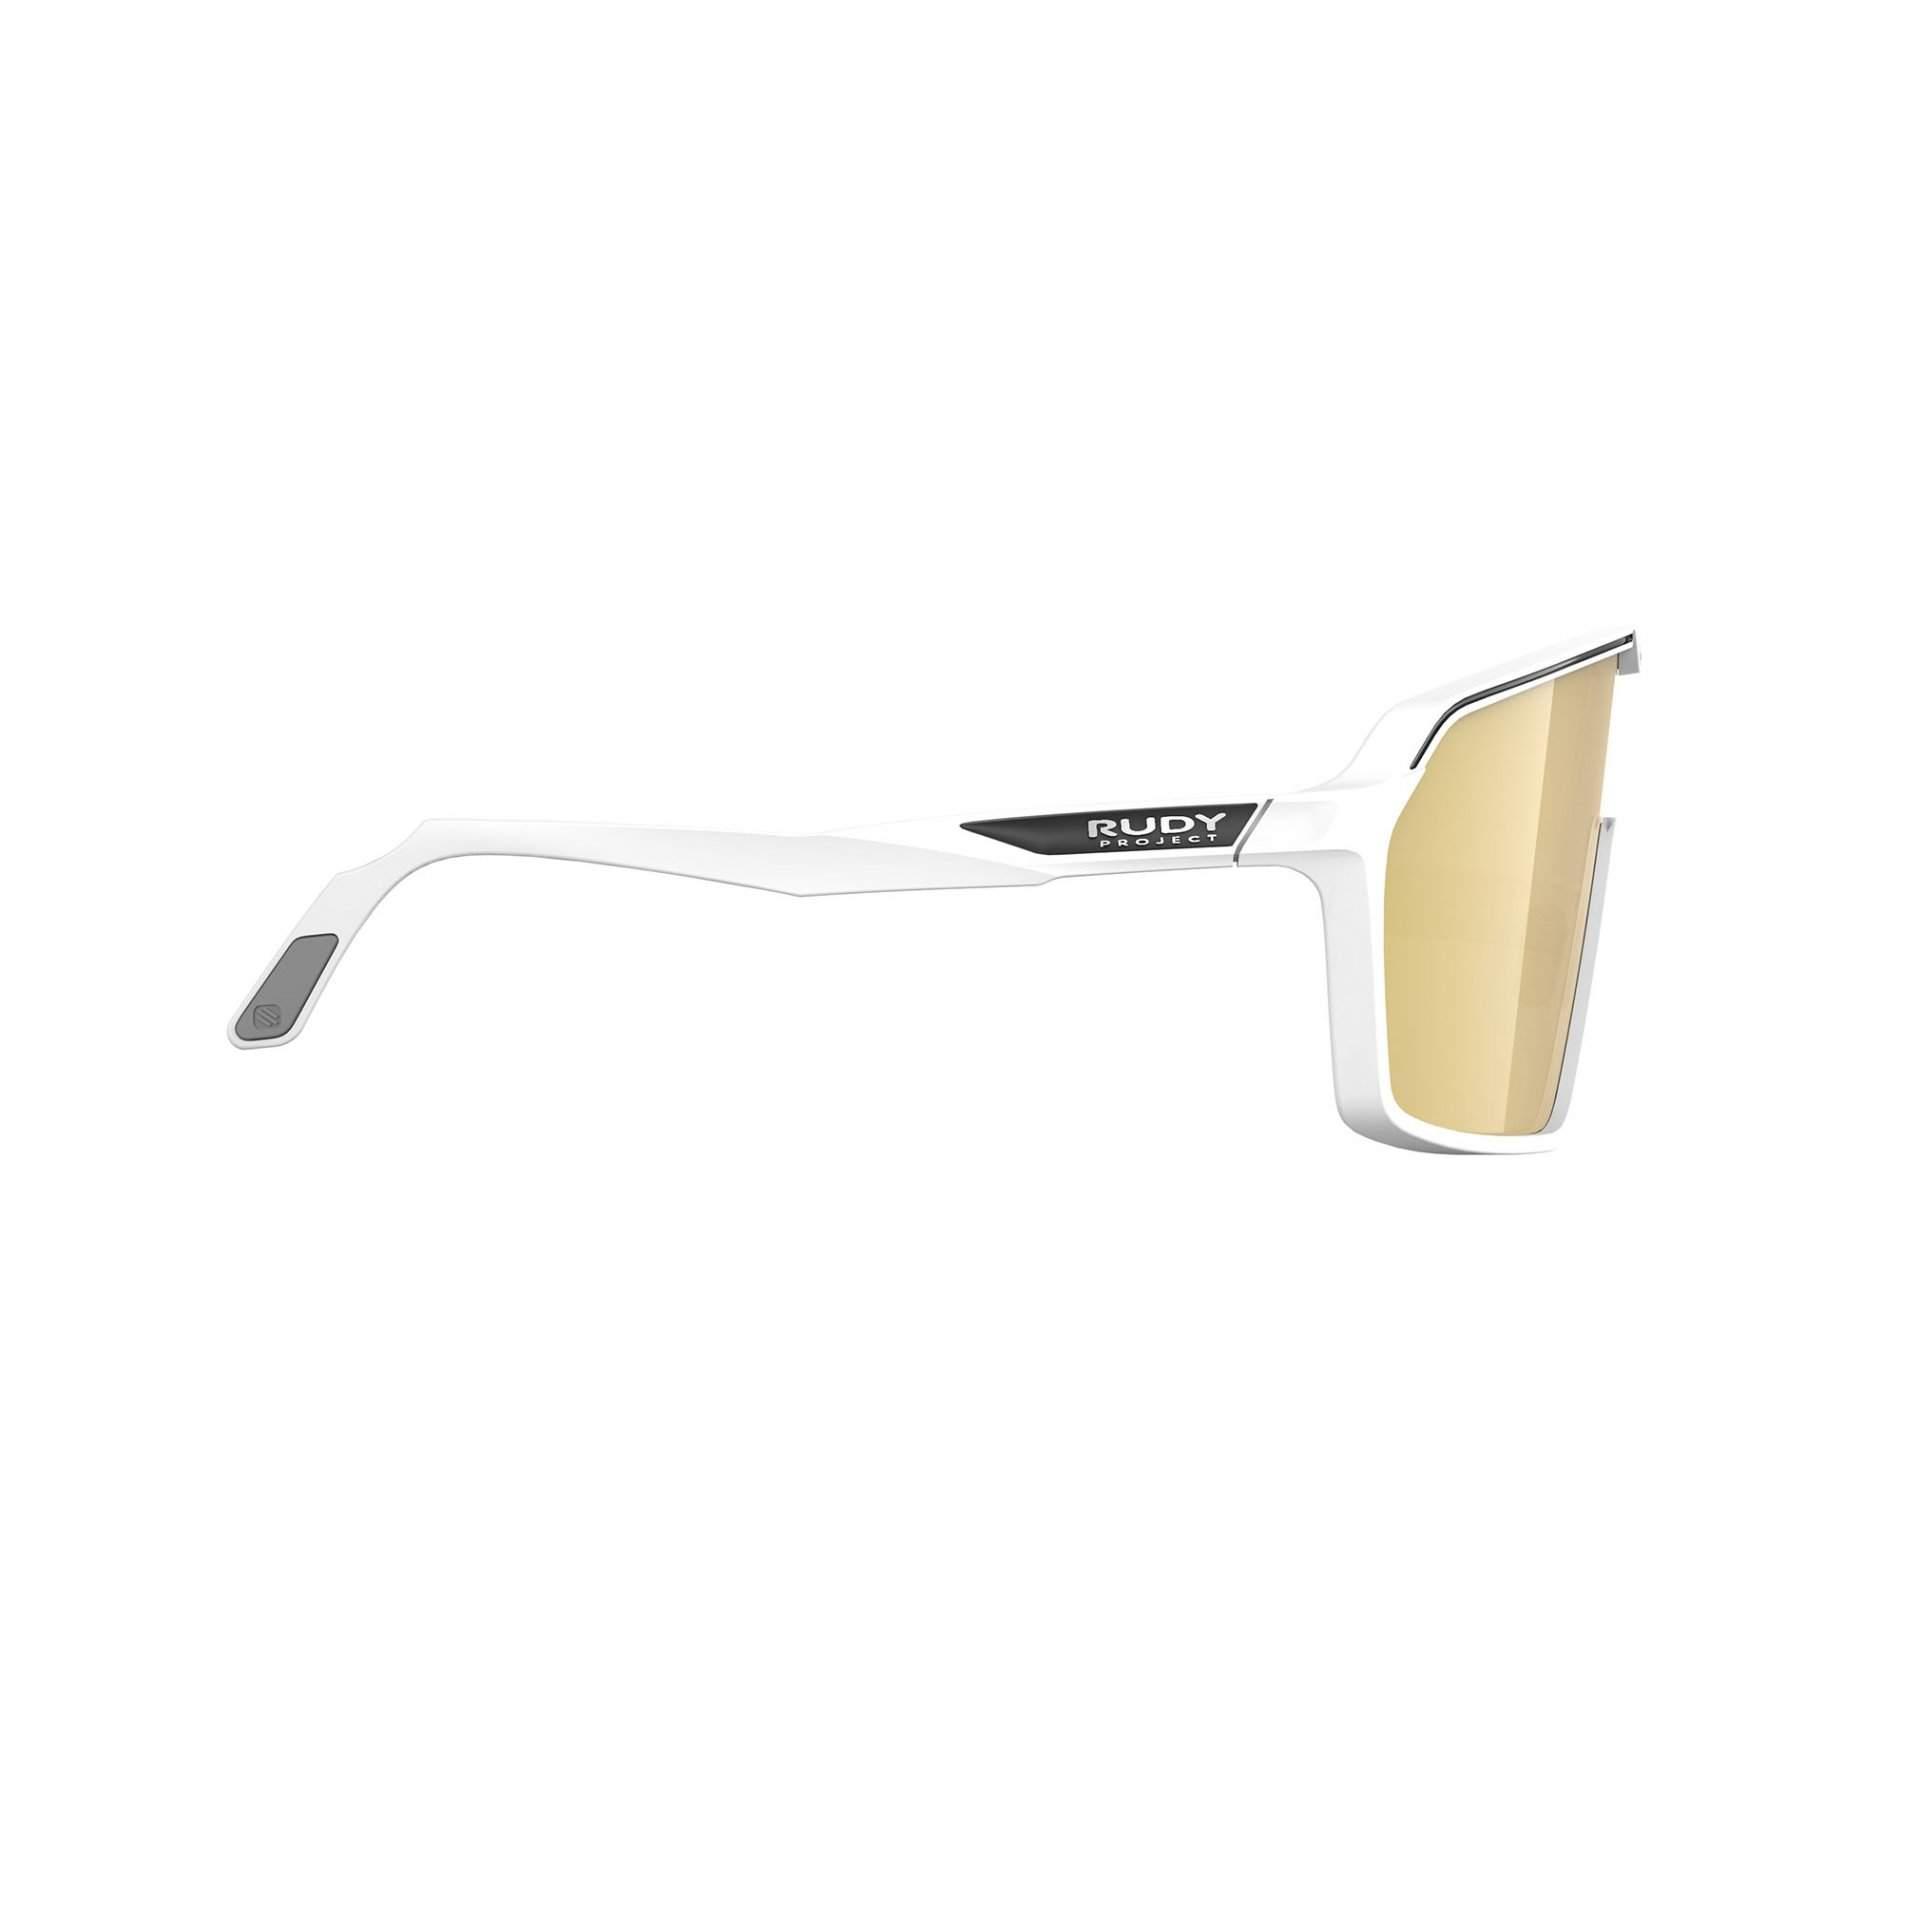 OKULARY RUDY PROJECT SPINSHIELD MULTILASER GOLD + WHITE MATTE SP7257580000 Z BOKU